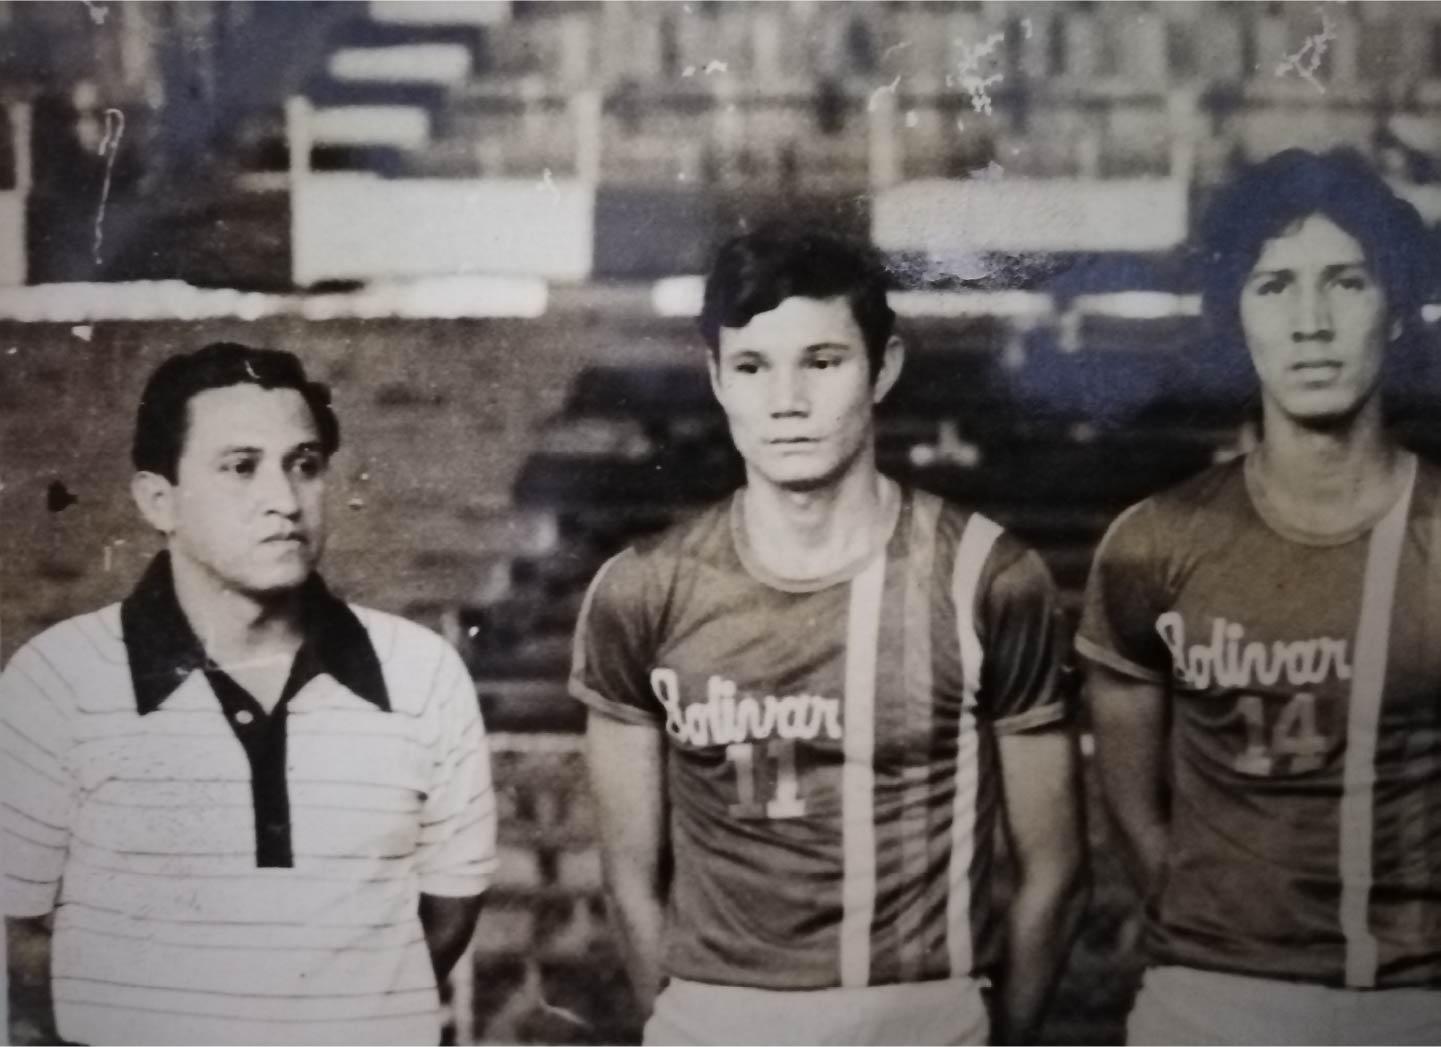 Hugo Sierra Uribe, señor del balón